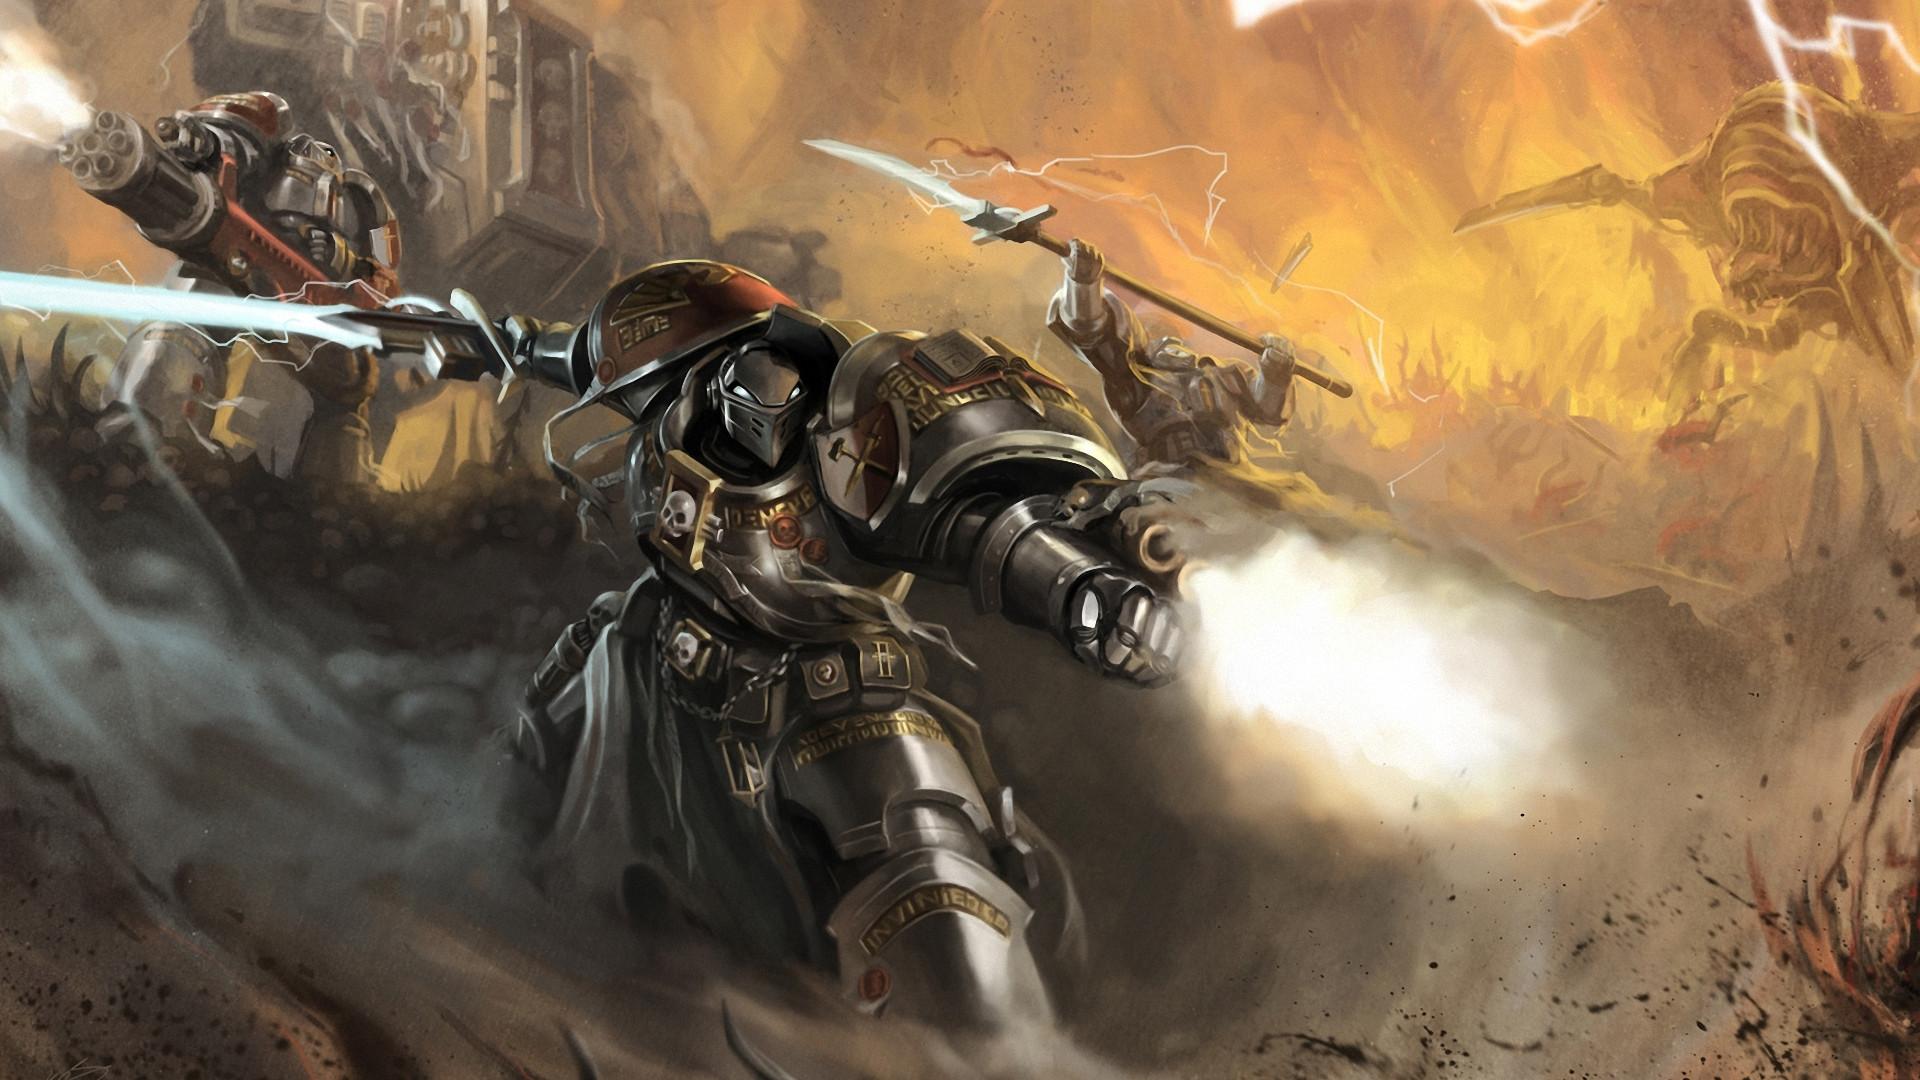 Res: 1920x1080,   Wallpaper okita, warhammer 40k, space marines, robot,  weapon, sword, · Download · Warhammer 40,000 - Space Marines [3] wallpaper